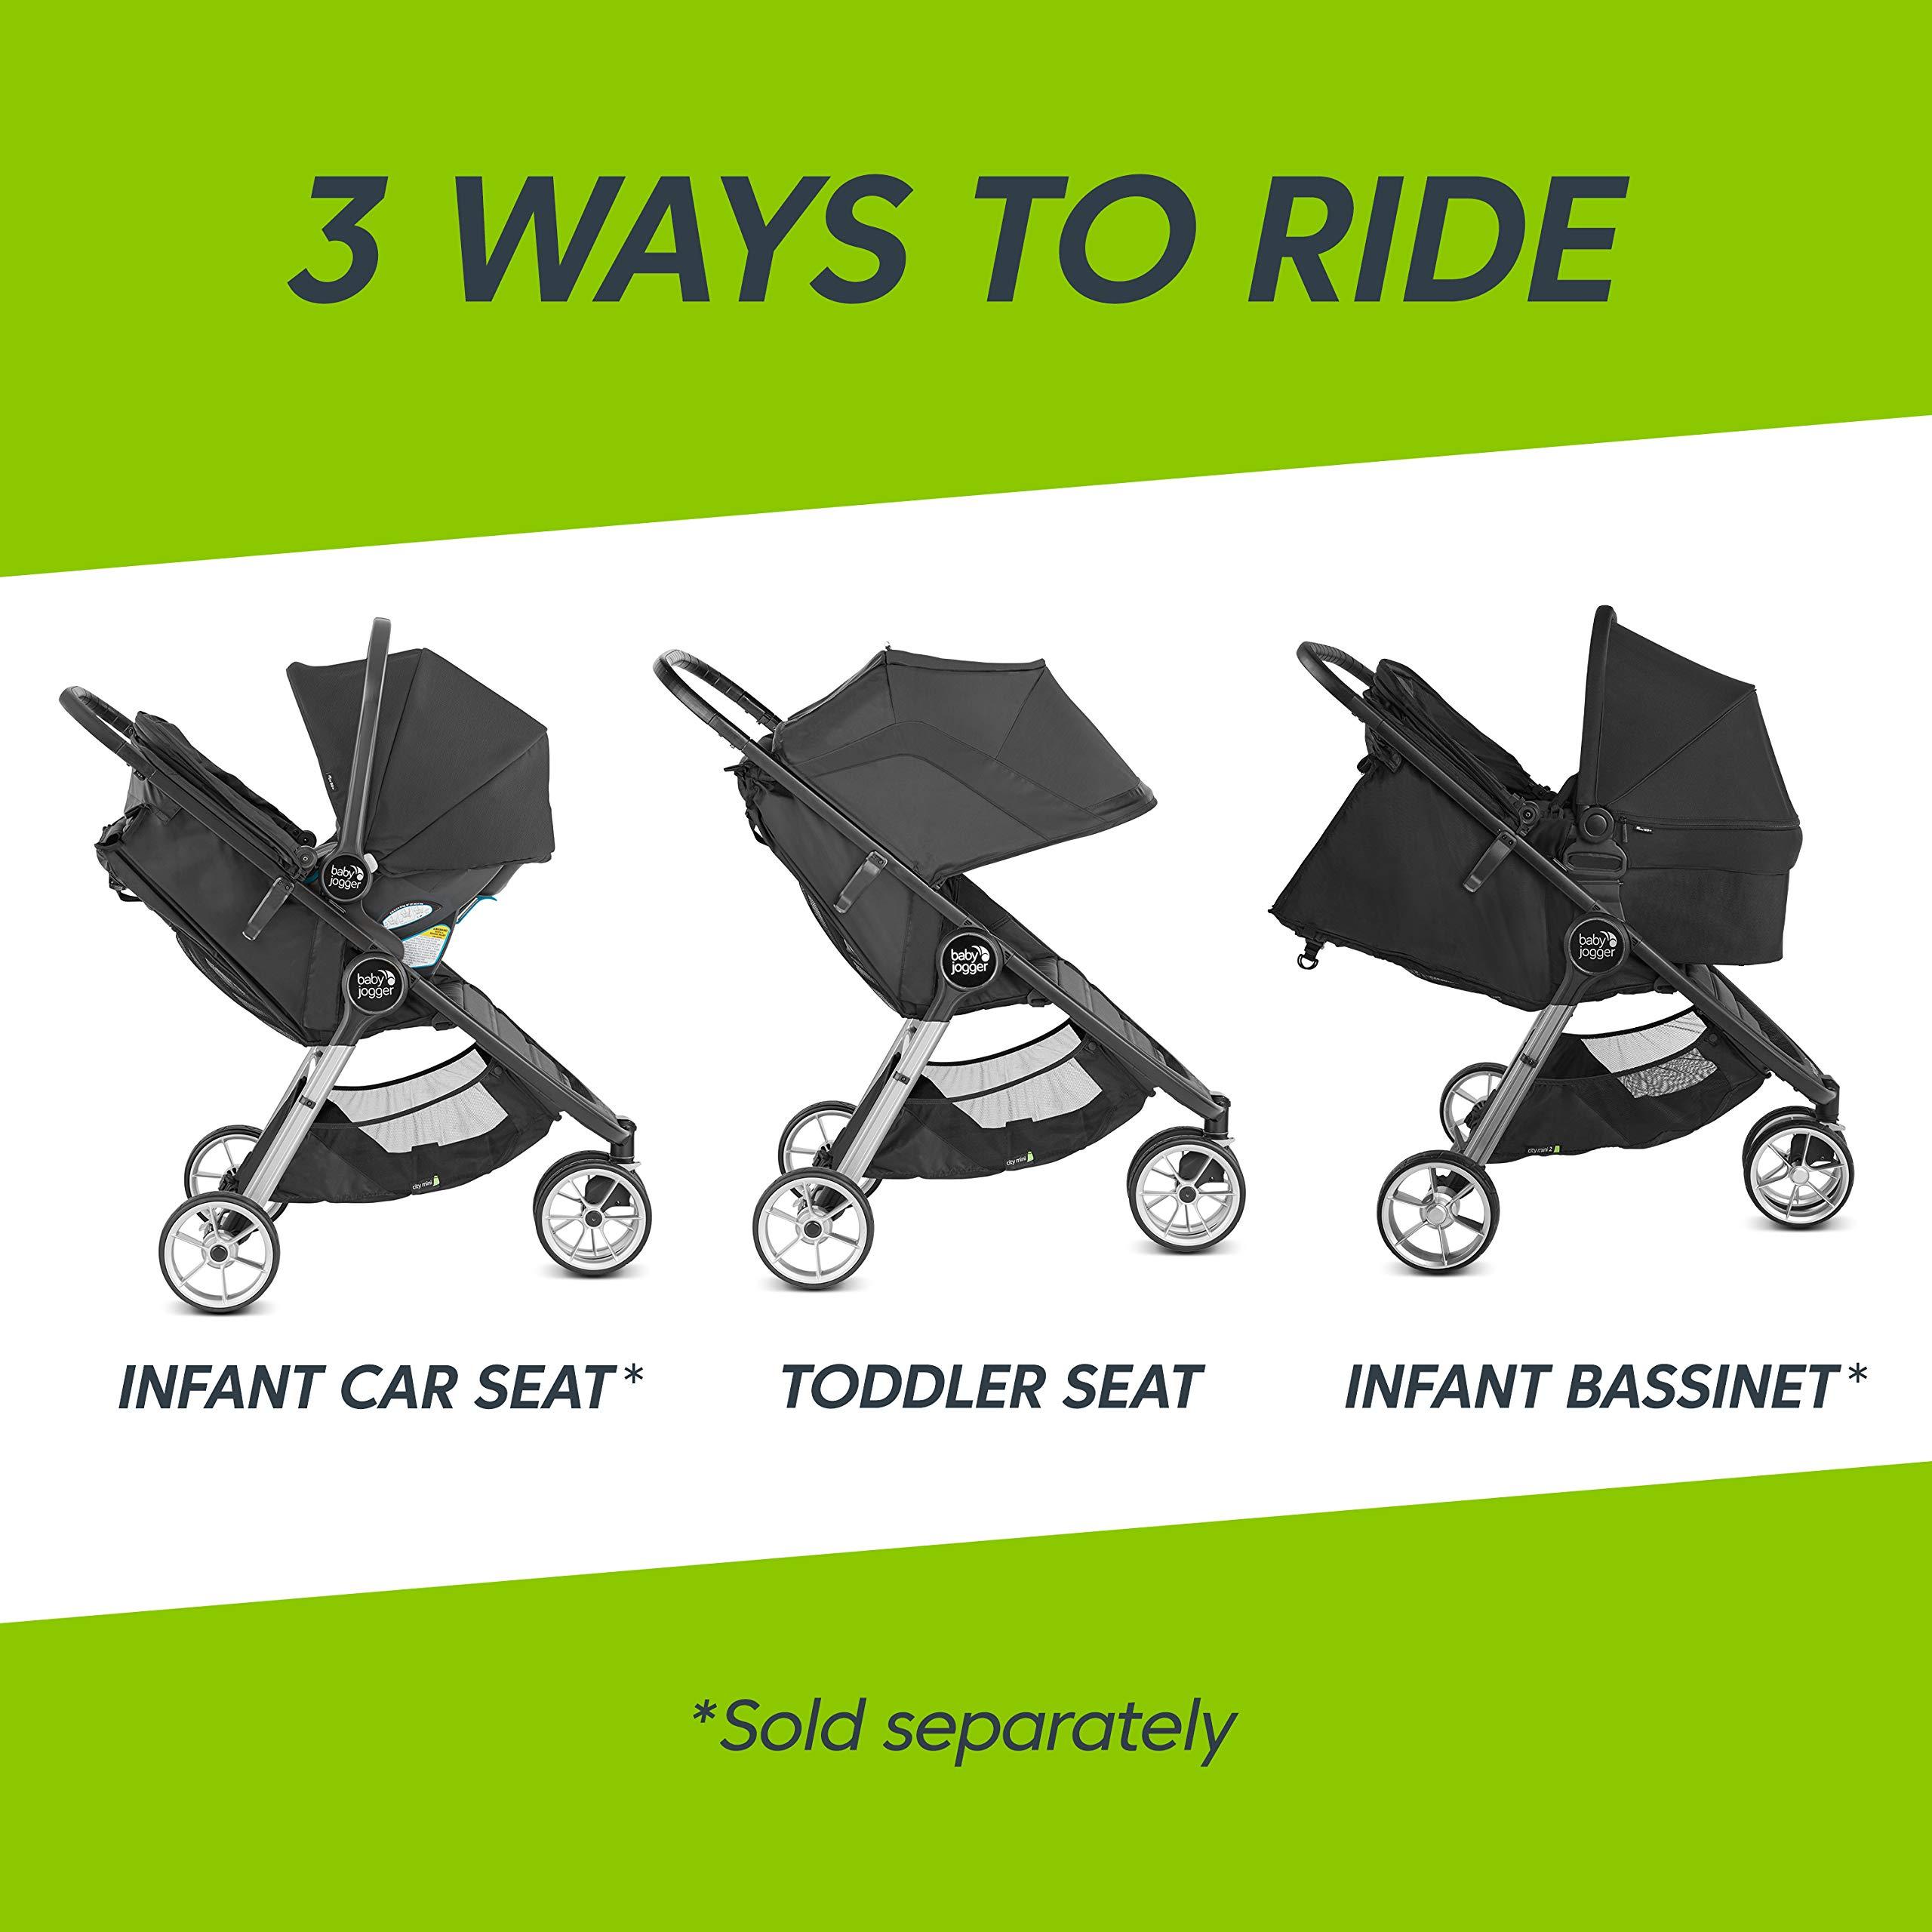 Baby Jogger City Mini 2 Stroller - 2019   Compact, Lightweight Stroller   Quick Fold Baby Stroller, Carbon by Baby Jogger (Image #5)